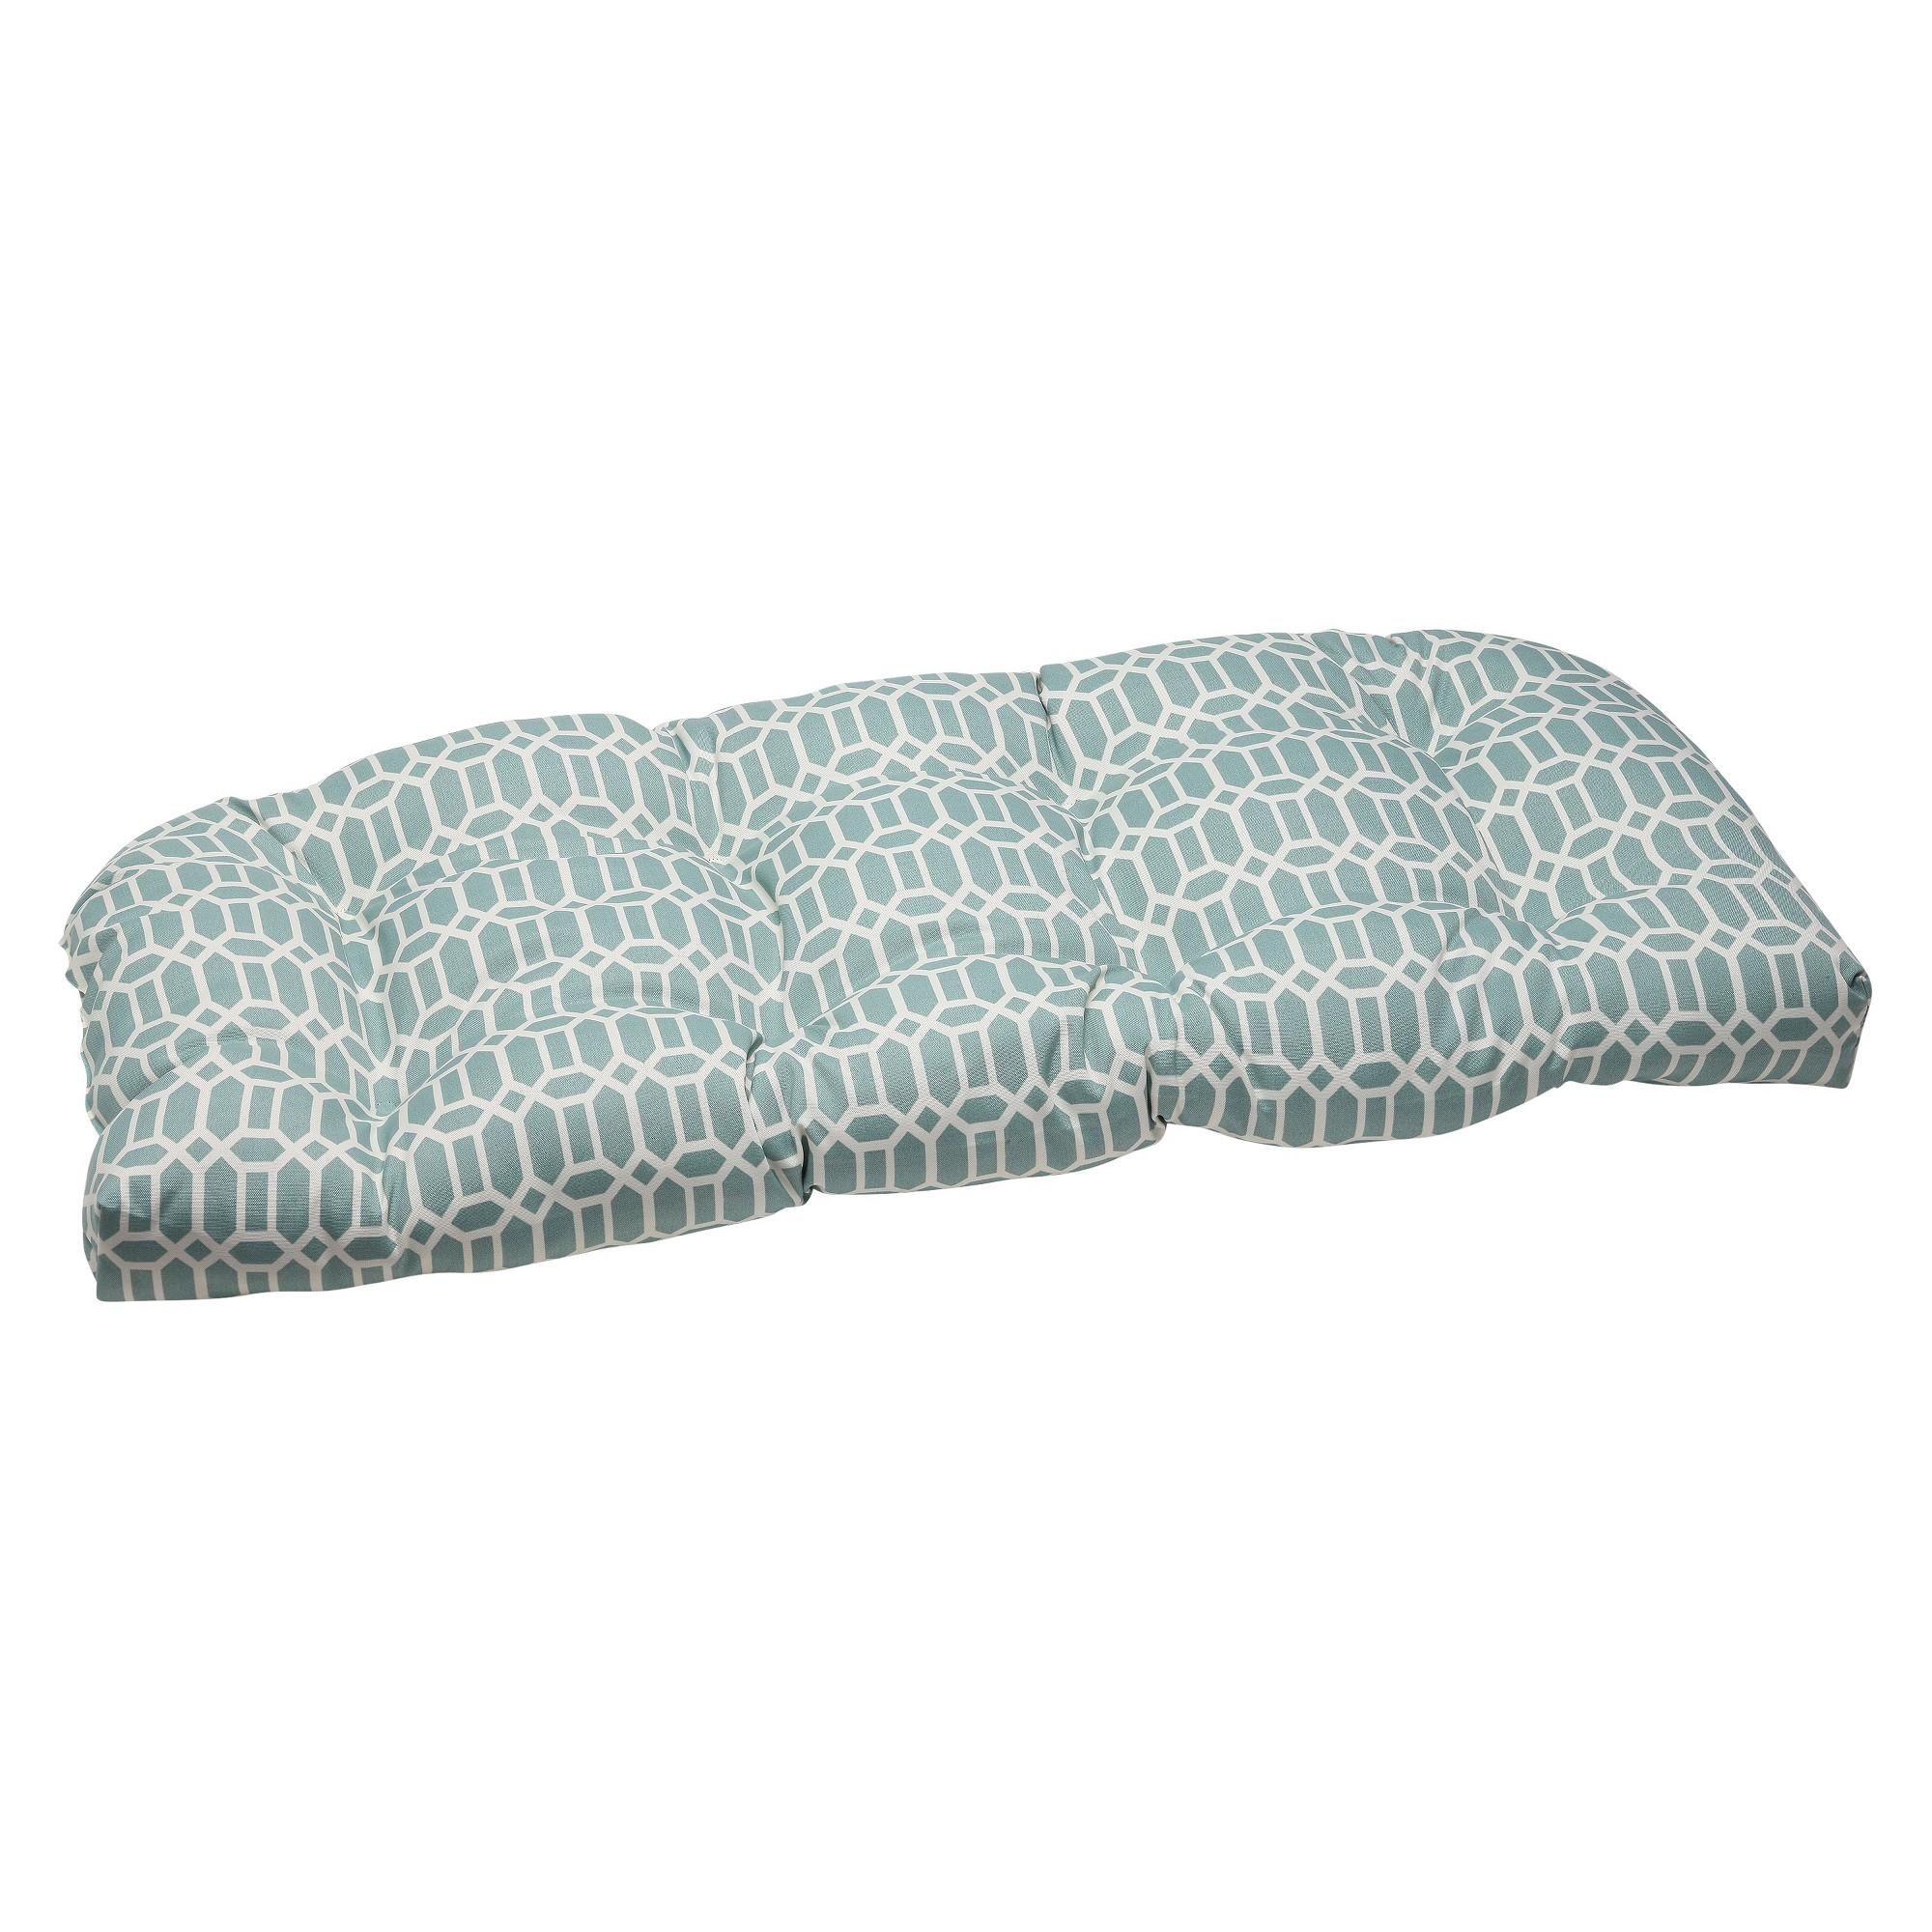 Pillow Perfect Outdoor Wicker Loveseat Cushion Rhodes